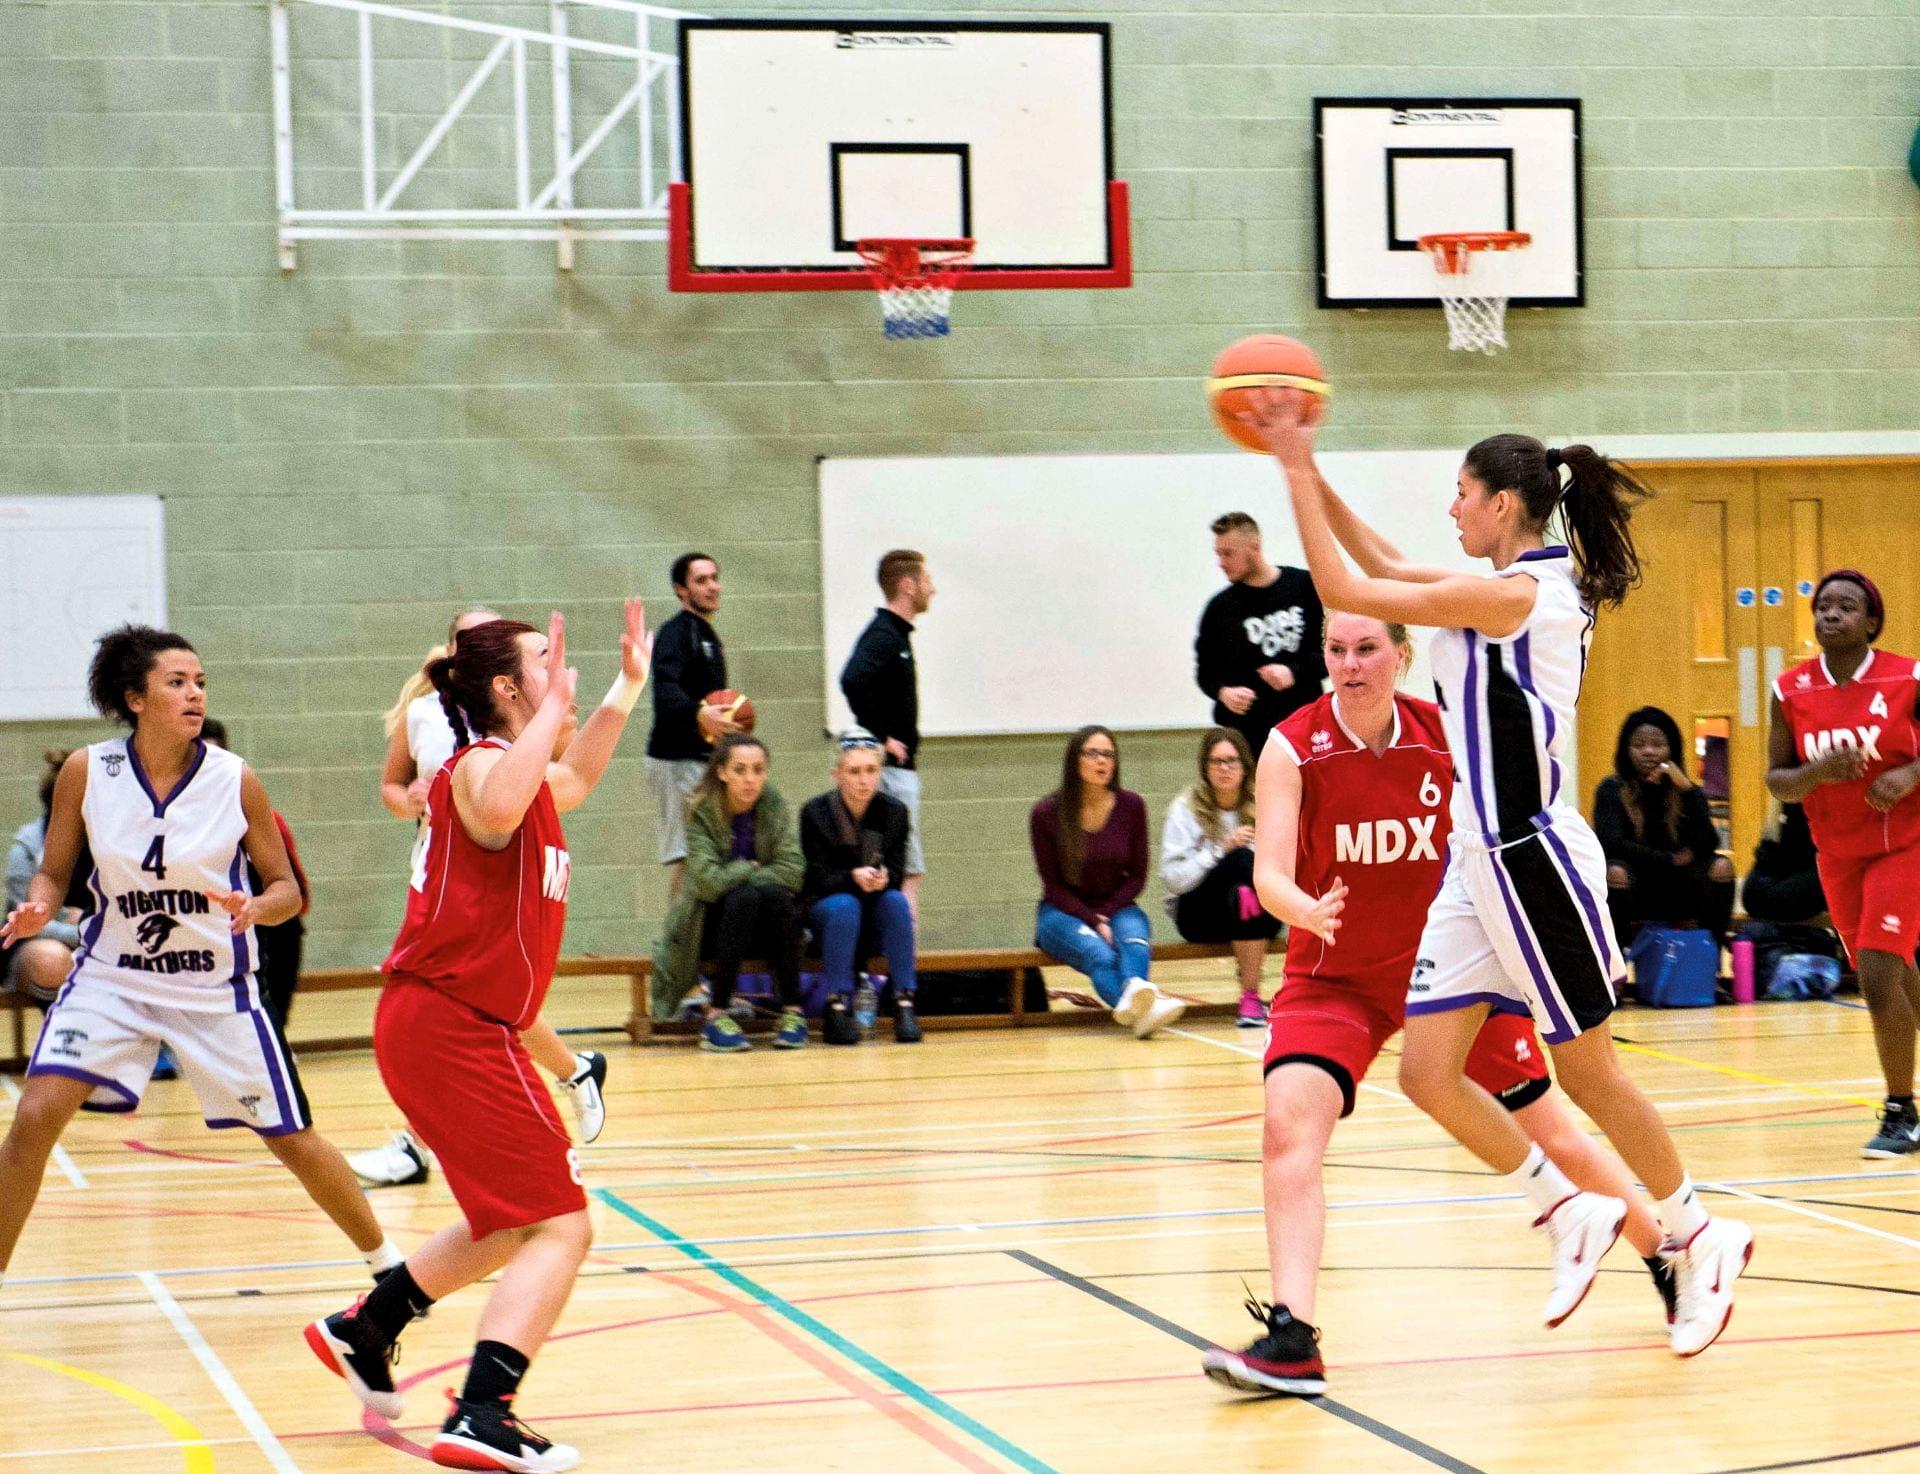 Brighton University basketball team playing.